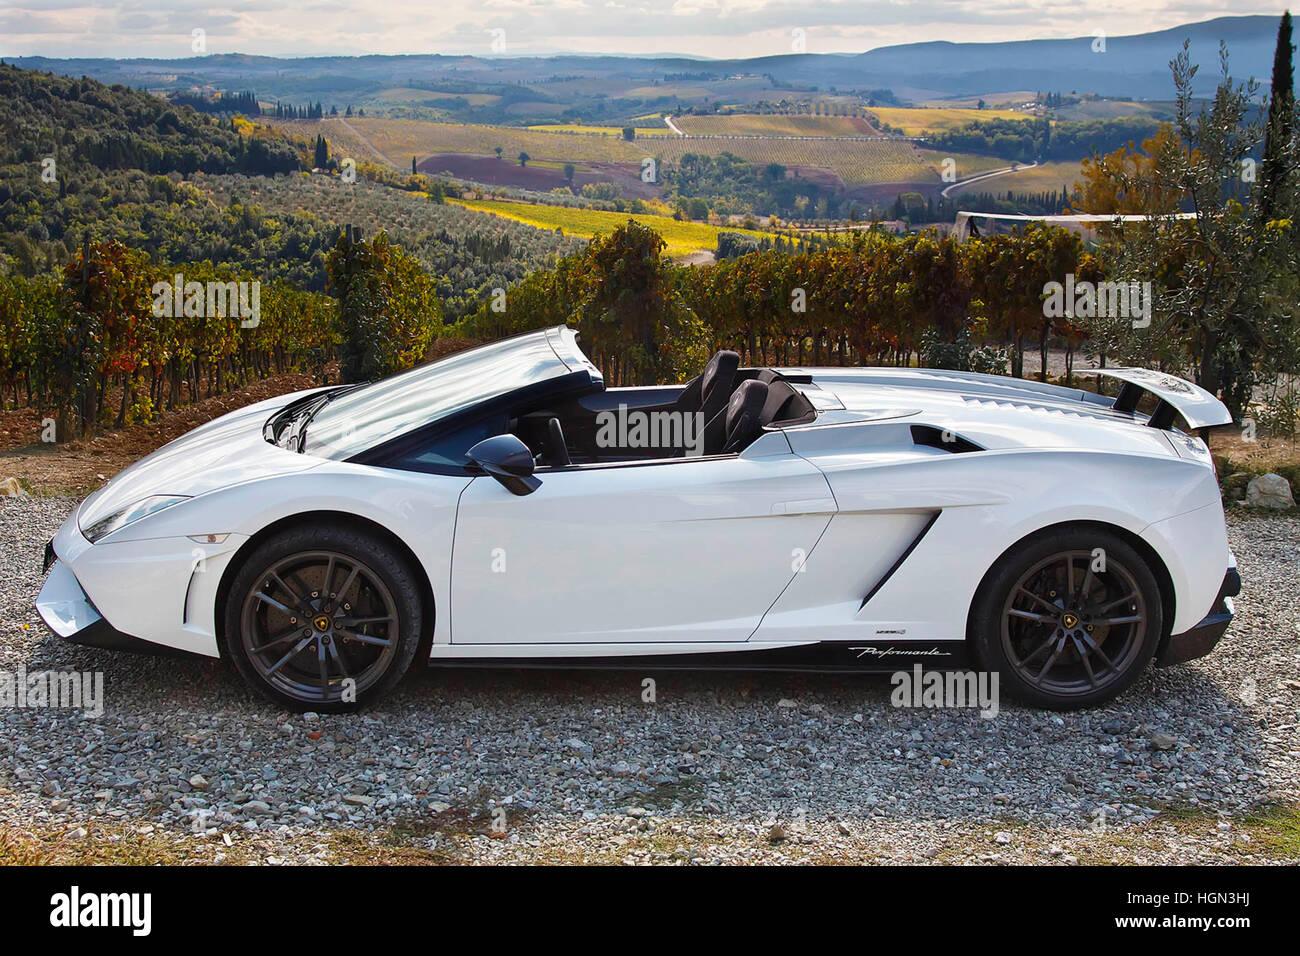 Lamborghini Gallardo Spyder Performante Tuscany Italy Stock Photo